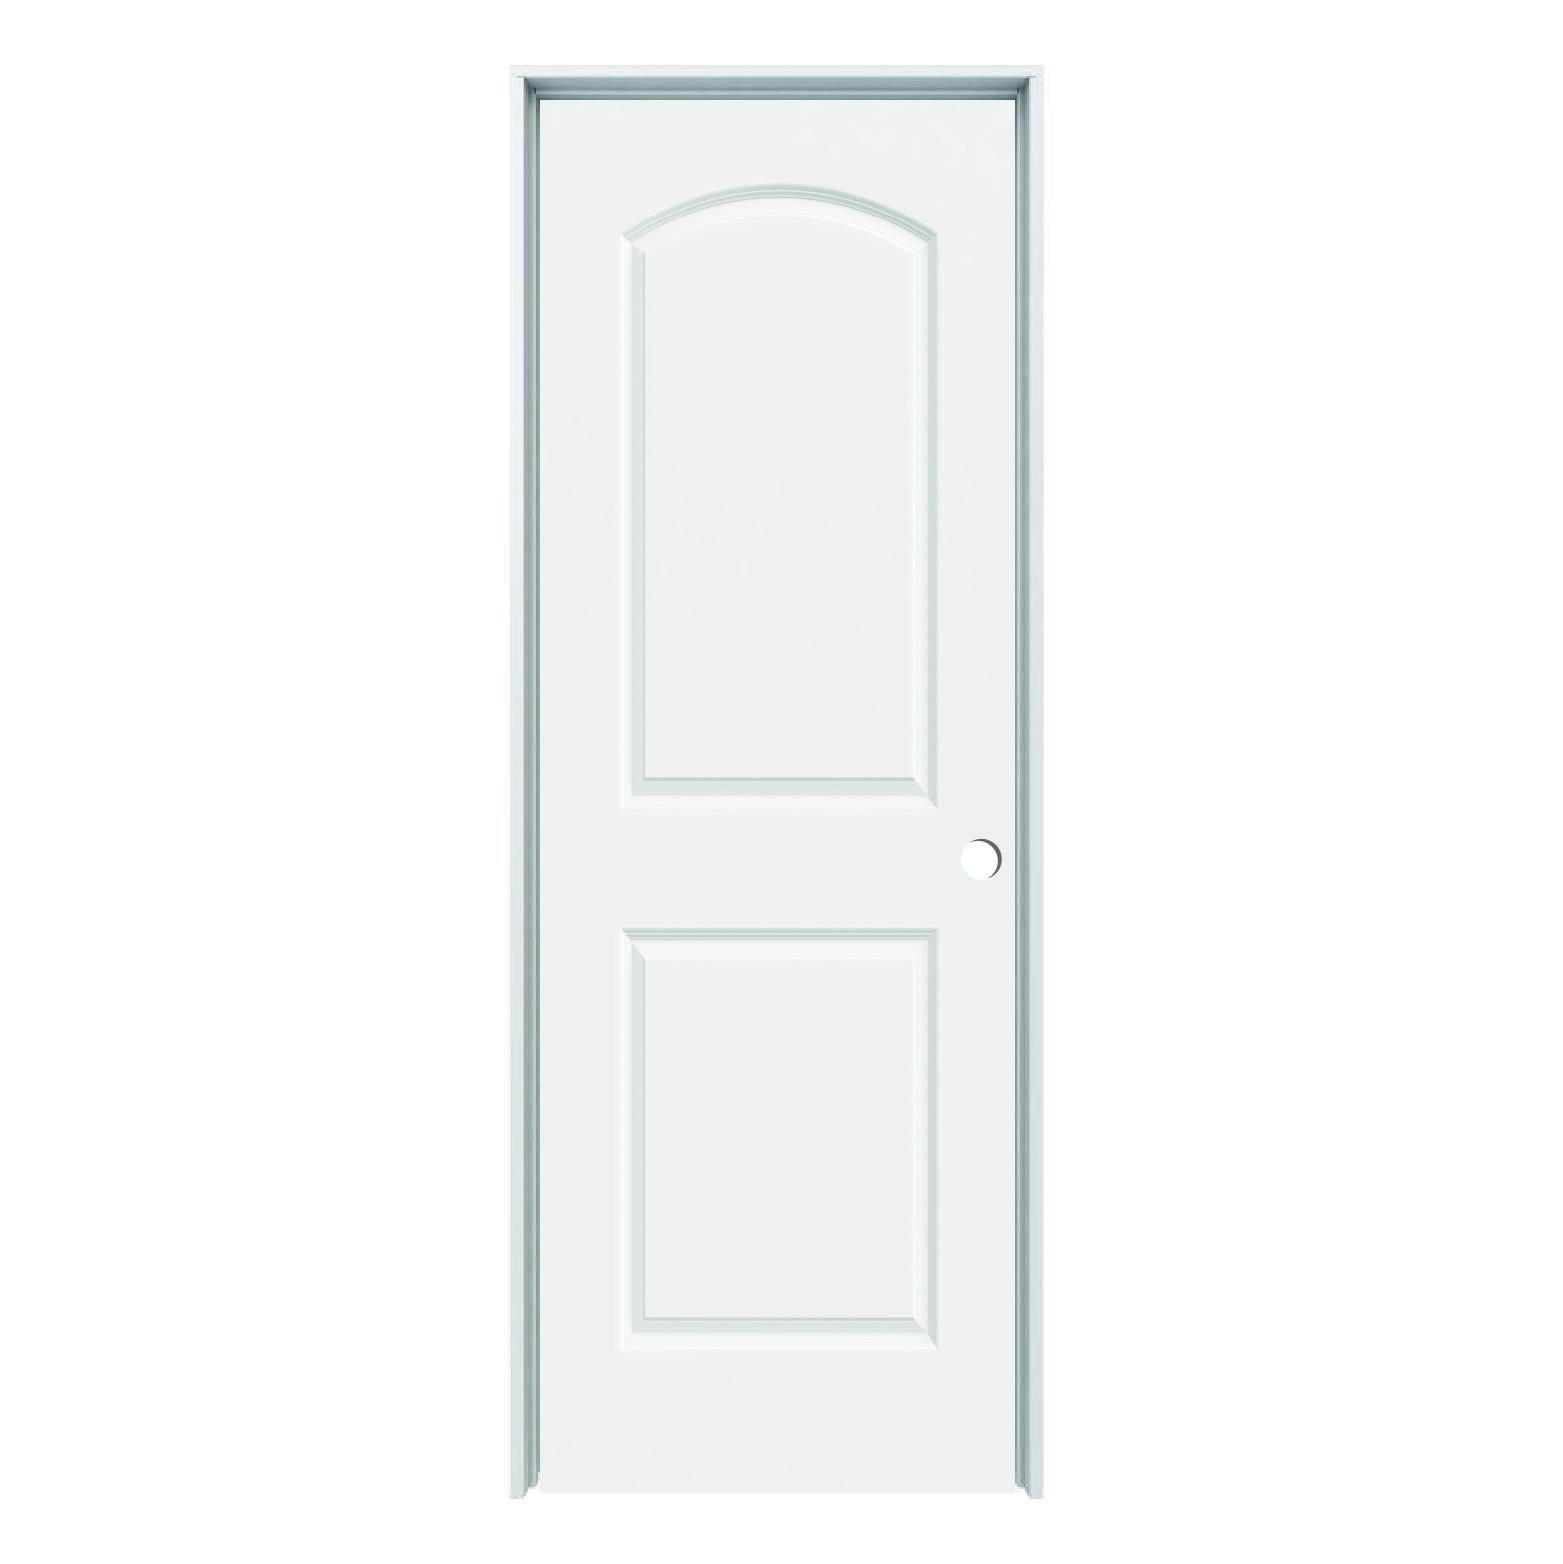 Solid core arch continental 2 panel prehung door rh 28 - Interior prehung solid core doors ...